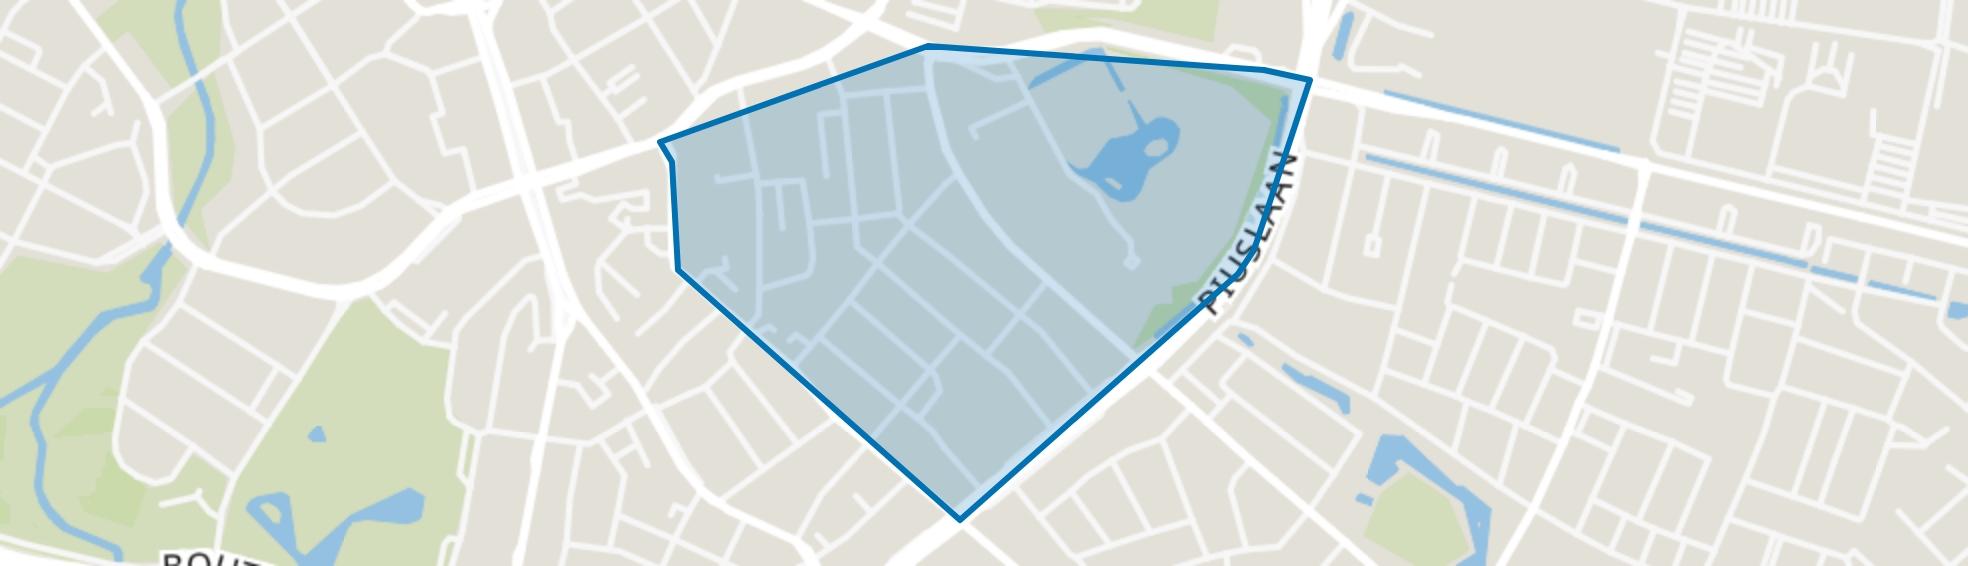 Tuindorp, Eindhoven map